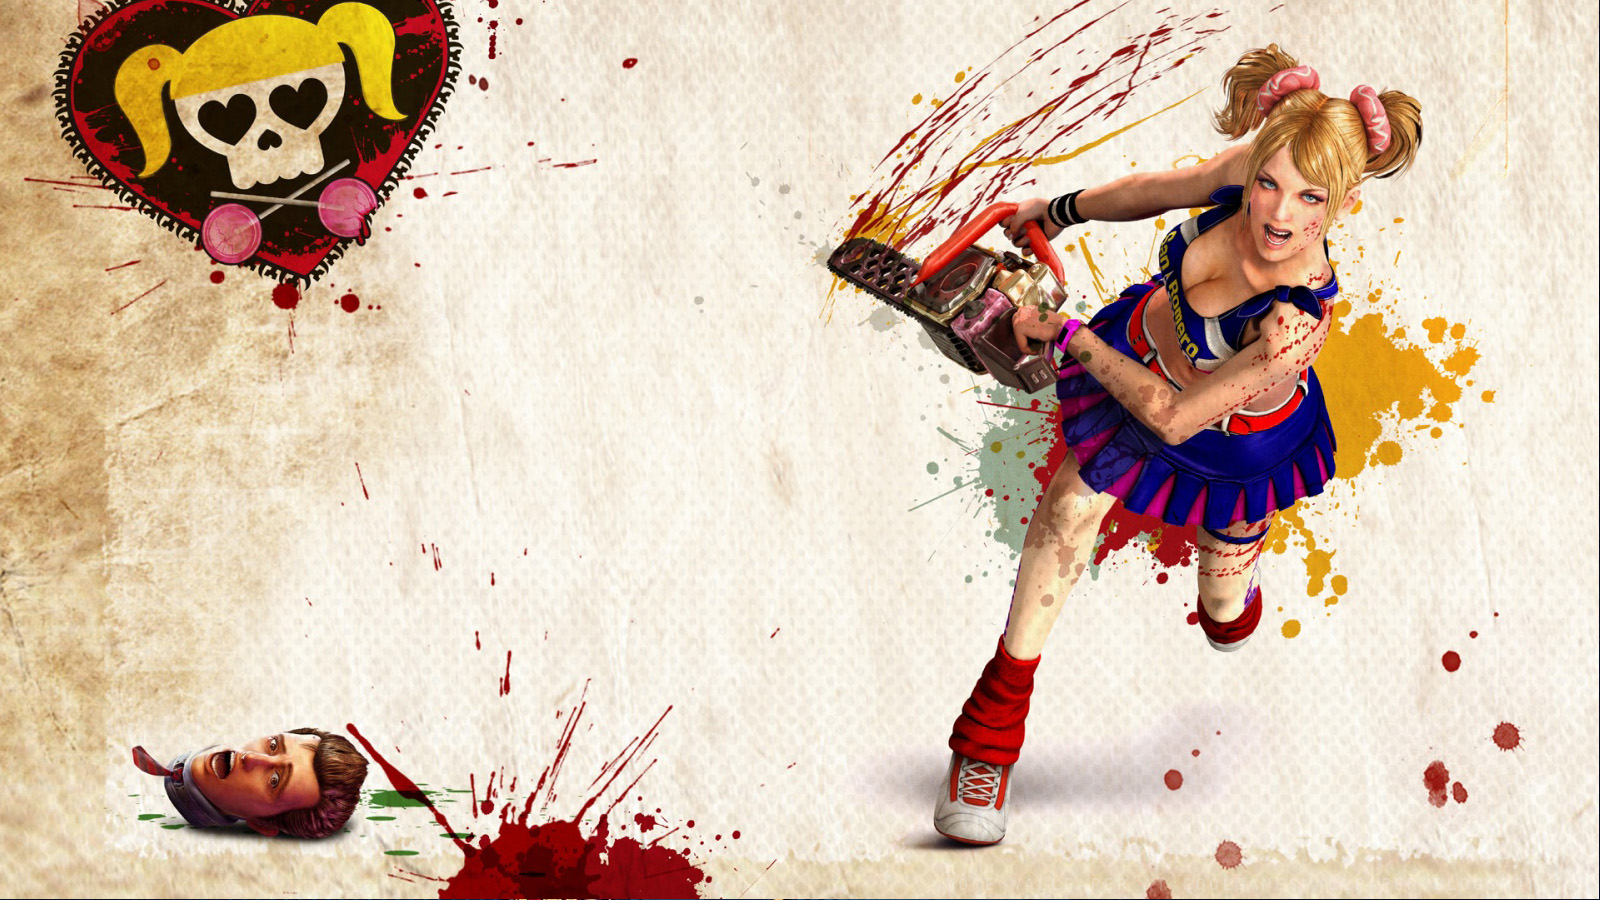 Juliet Cheerleader Zombie Hunter #6963006 7 Themes  - juliet cheerleader zombie hunter wallpapers